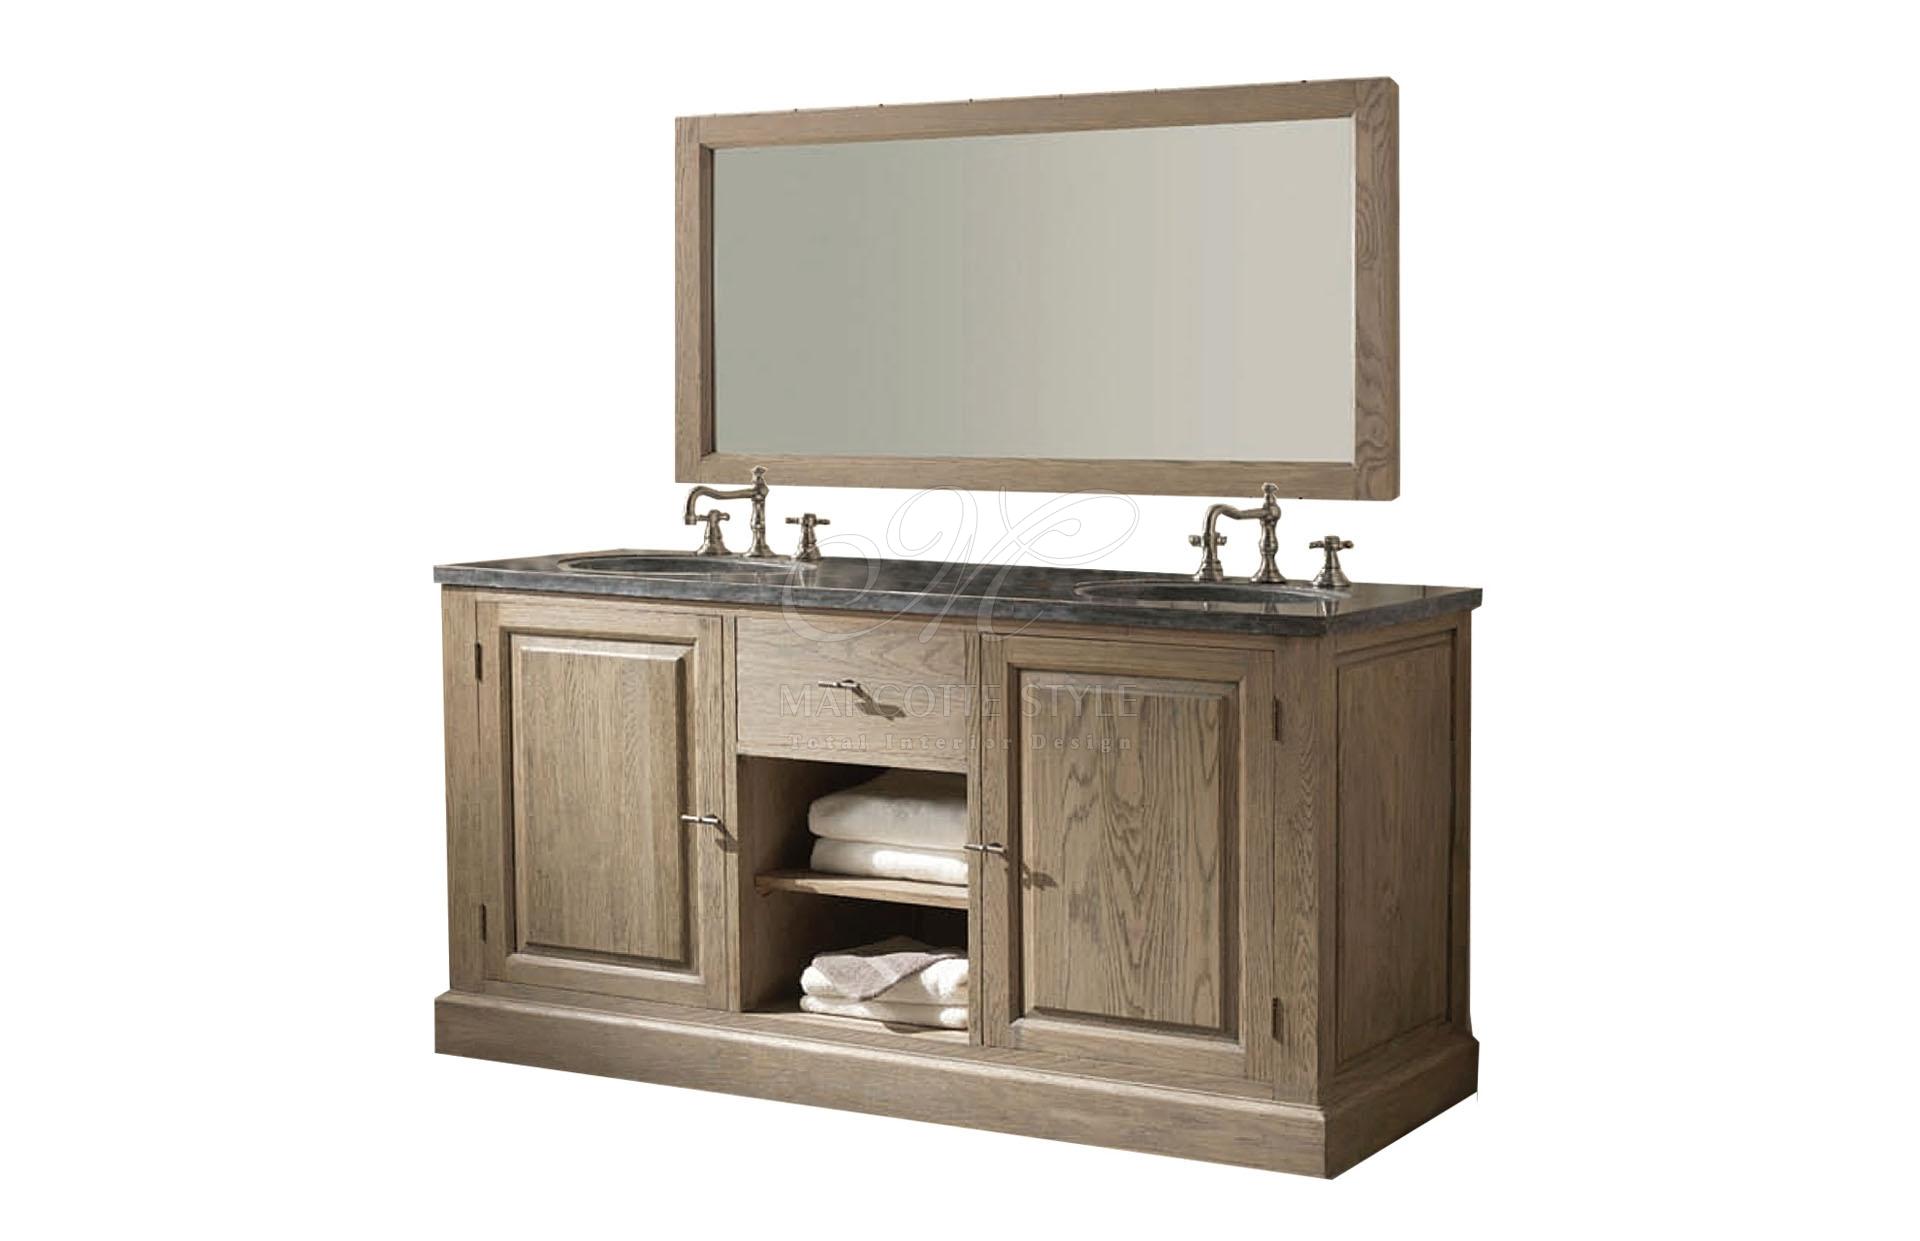 Newmarc badkamermeubels marcottestyle - Foto badkamer meubels ...